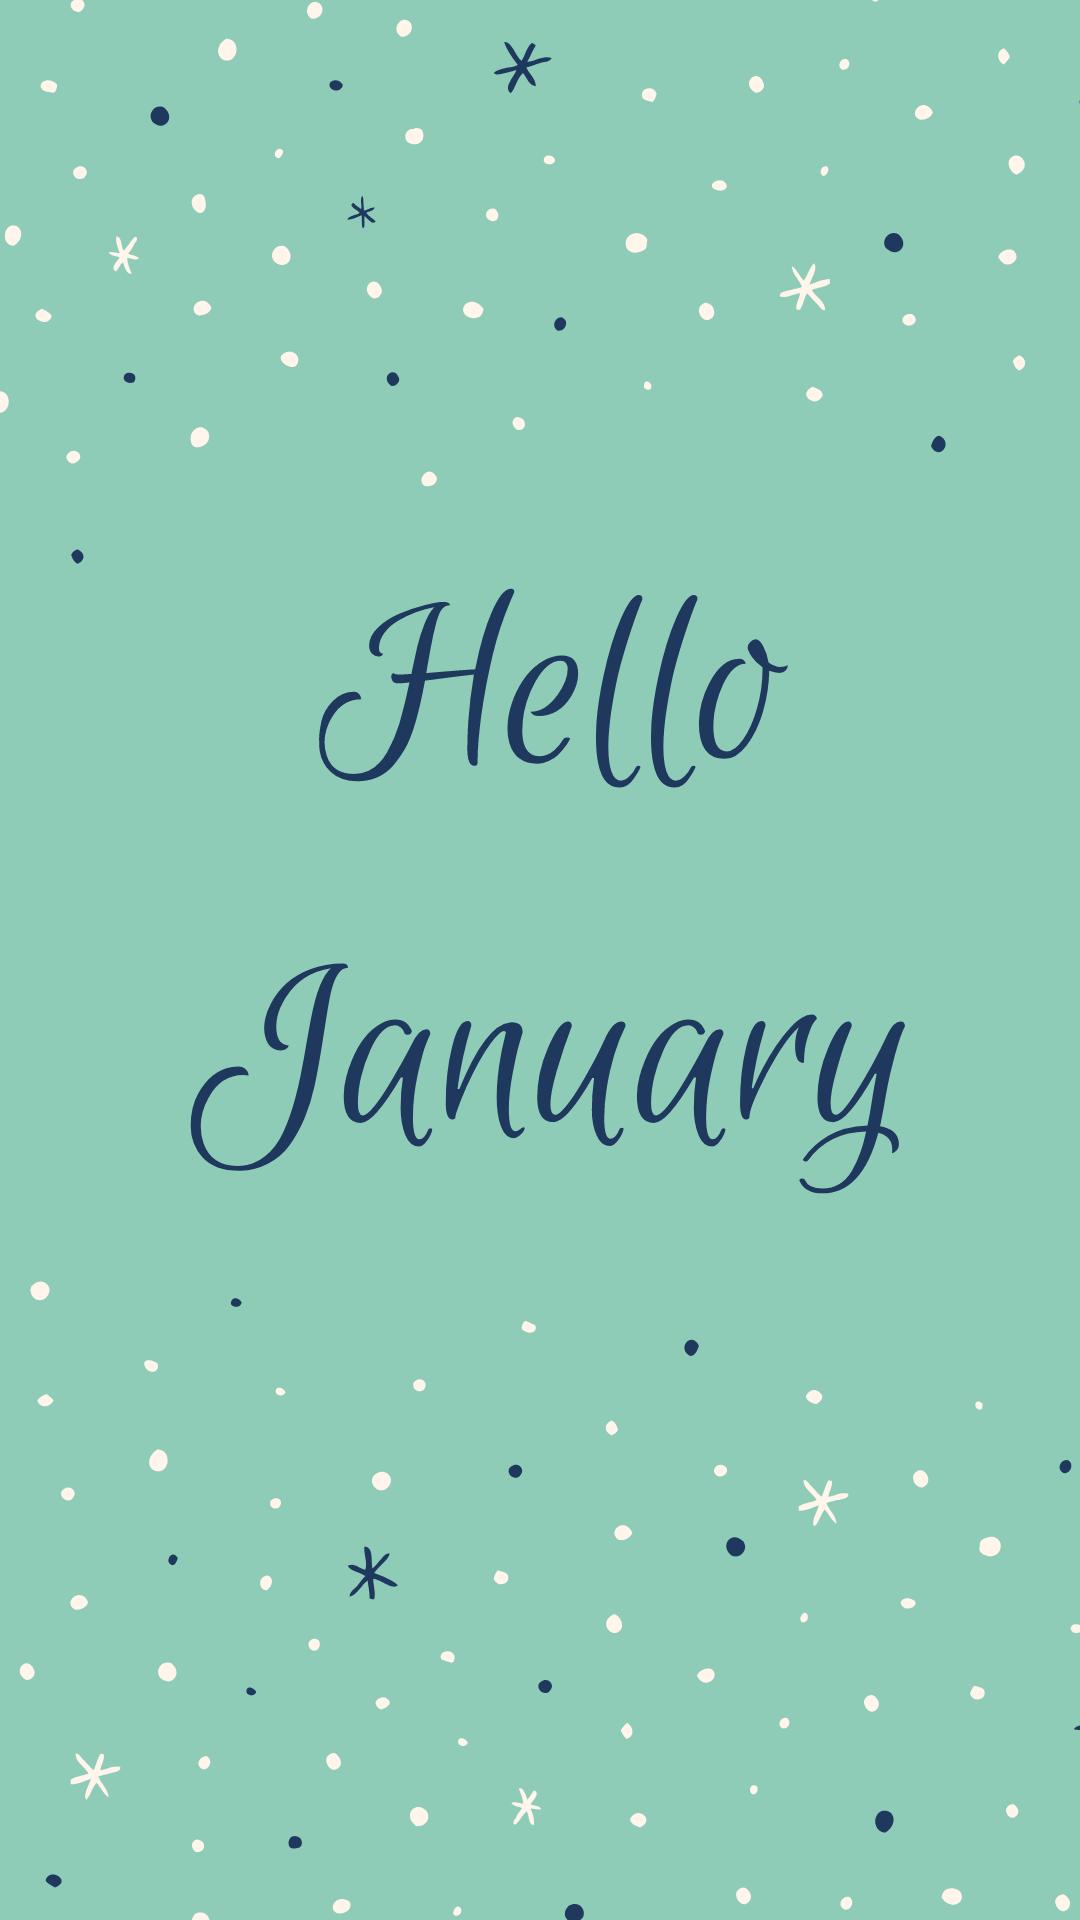 January 2019 Fond d'écran January wallpaper, Iphone